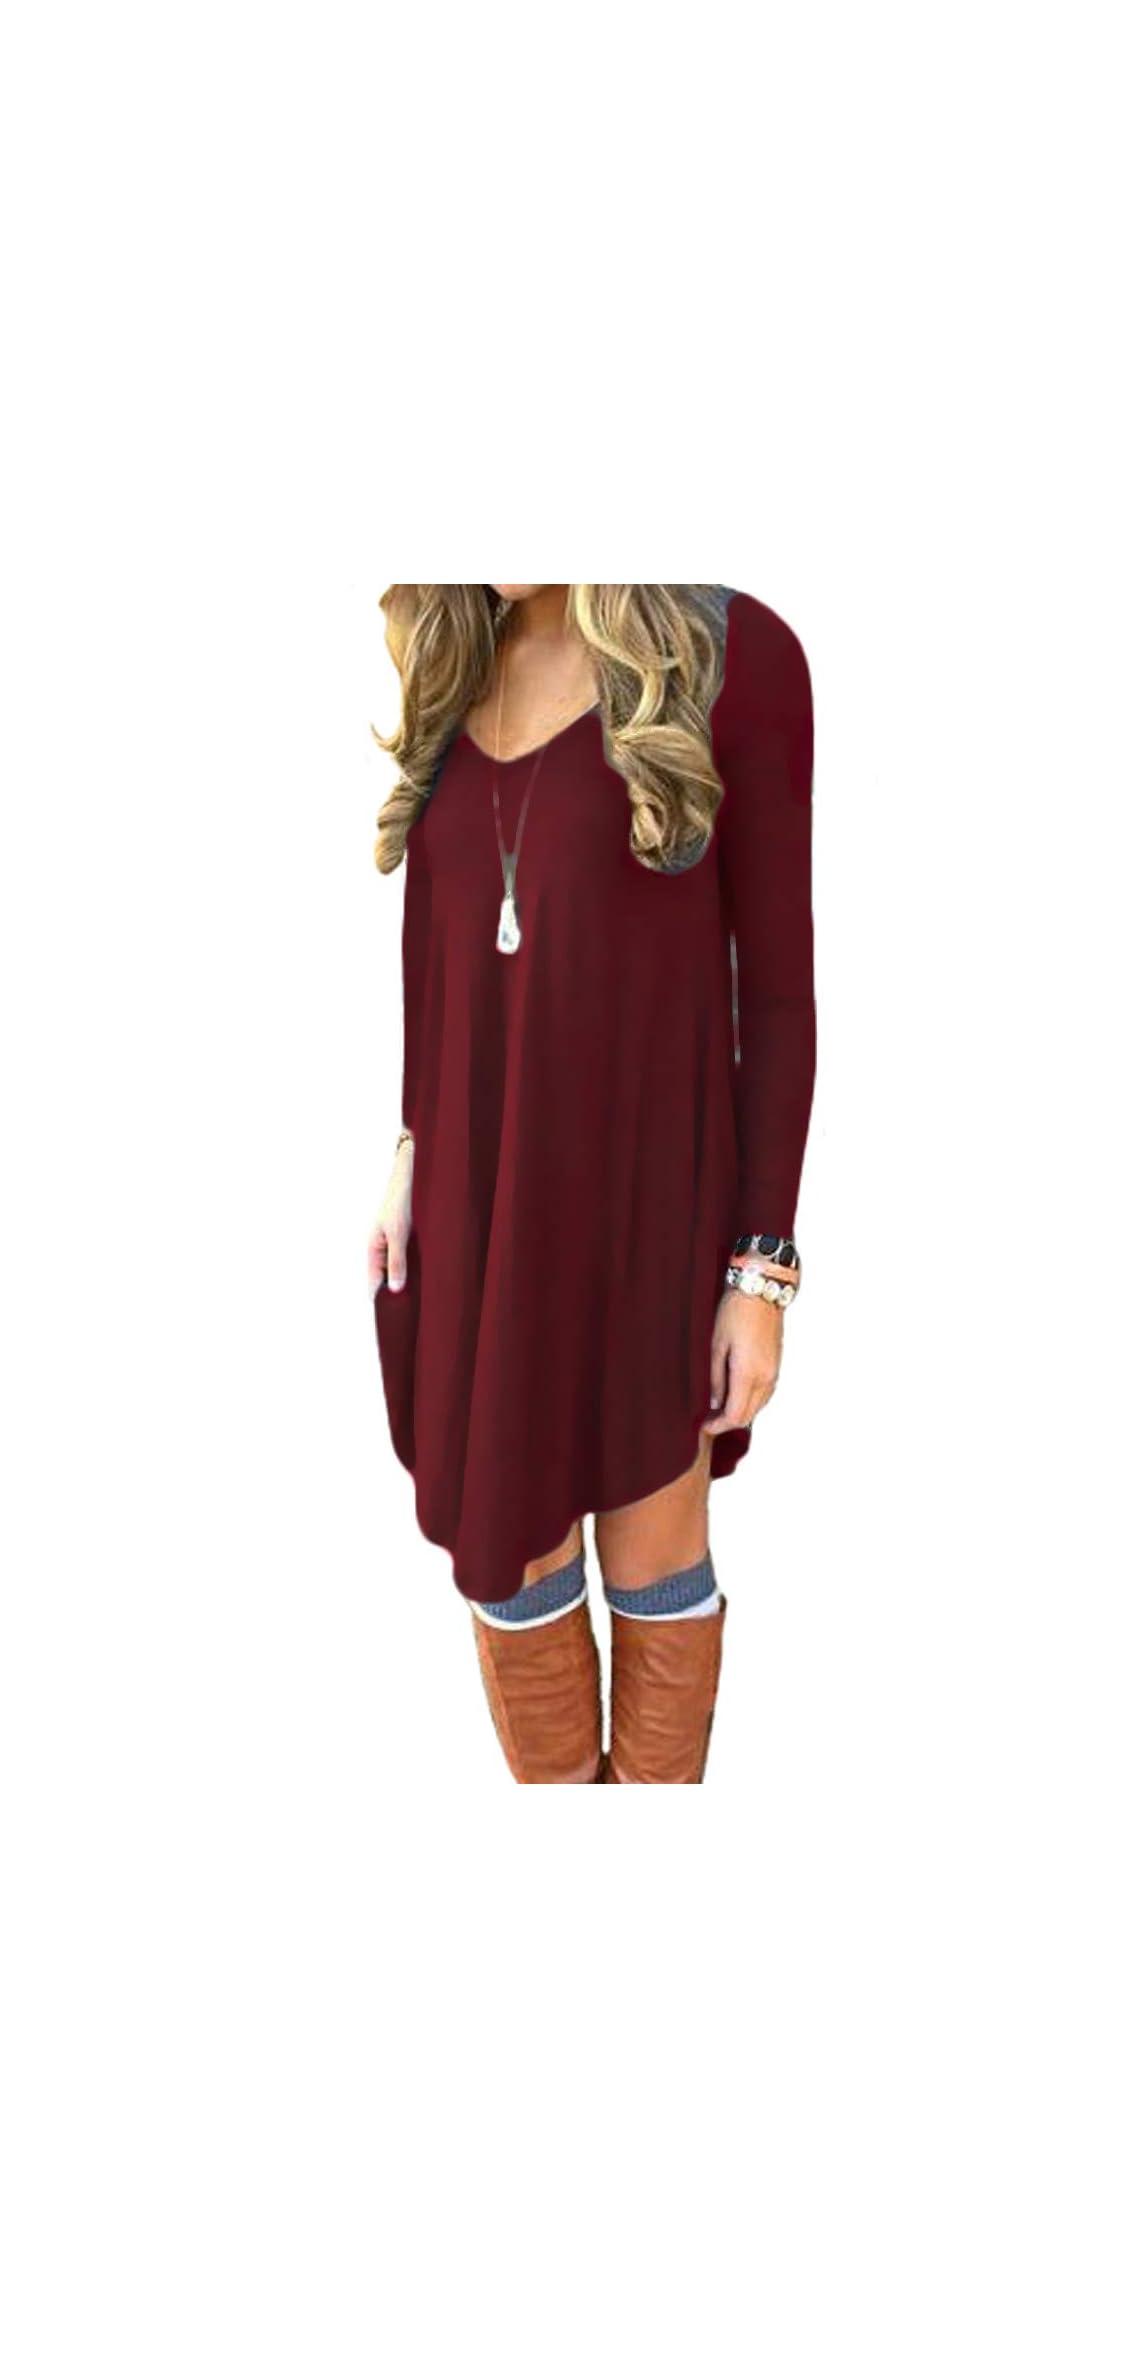 Women's Long Sleeve Casual Loose T-shirt Dress